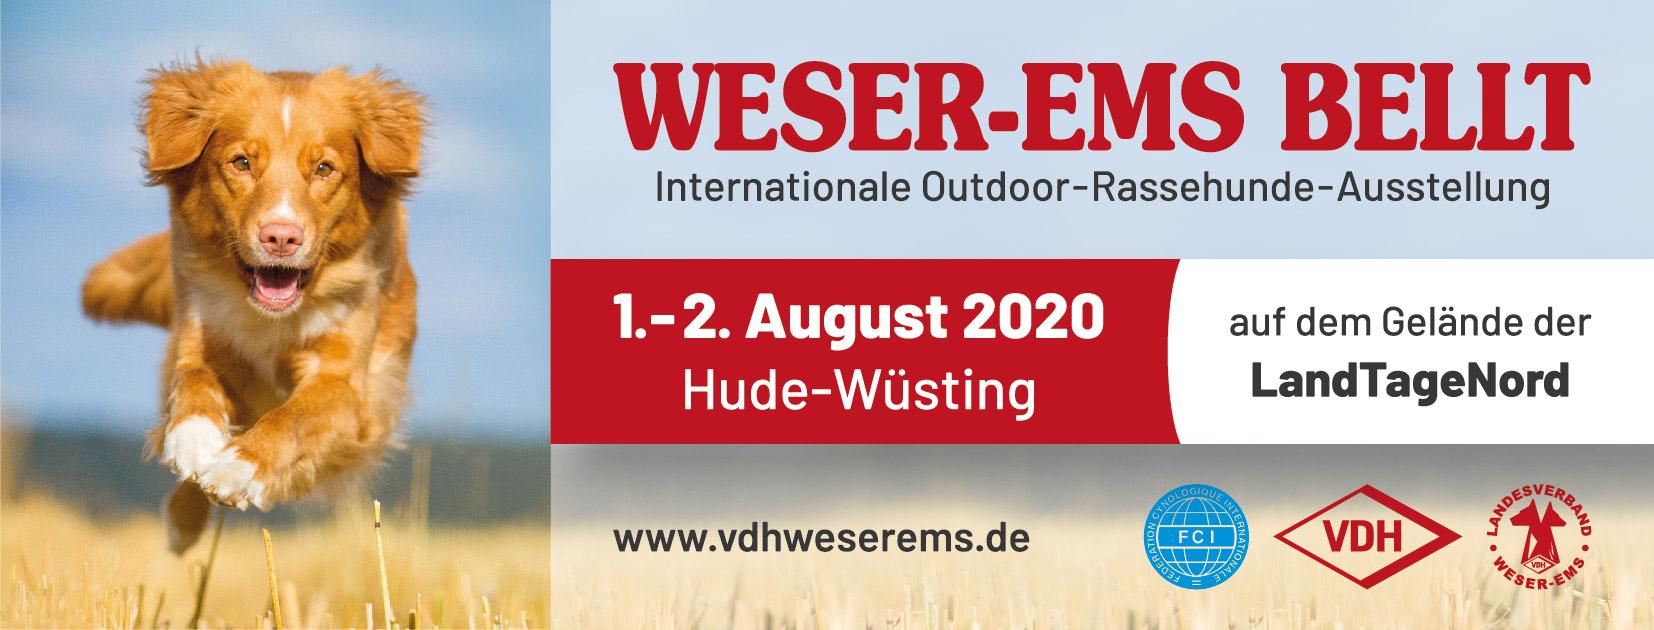 Rassehunde©VDH Weser-Ems